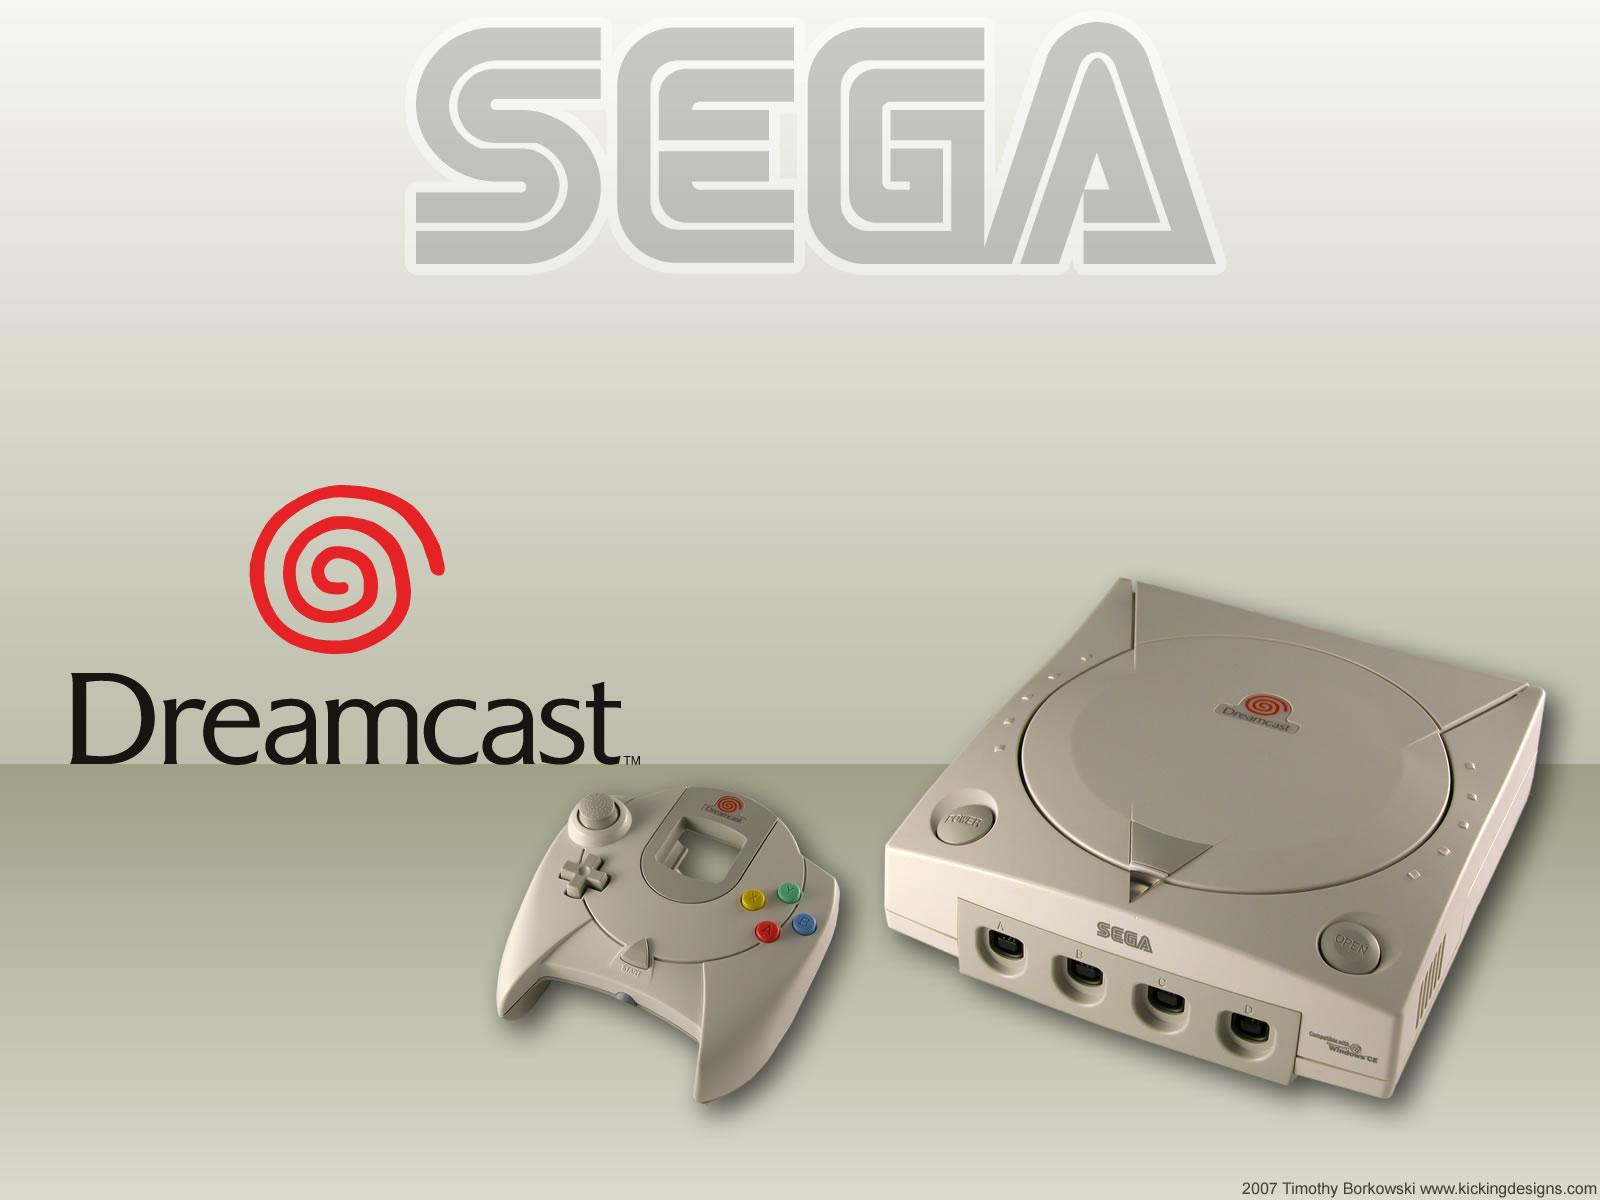 http://2.bp.blogspot.com/_BDCqpuwRnf4/S9FrDD9a6iI/AAAAAAAAFvQ/KWgk0EJ47MA/s1600/sega-dreamcast_1600.jpg